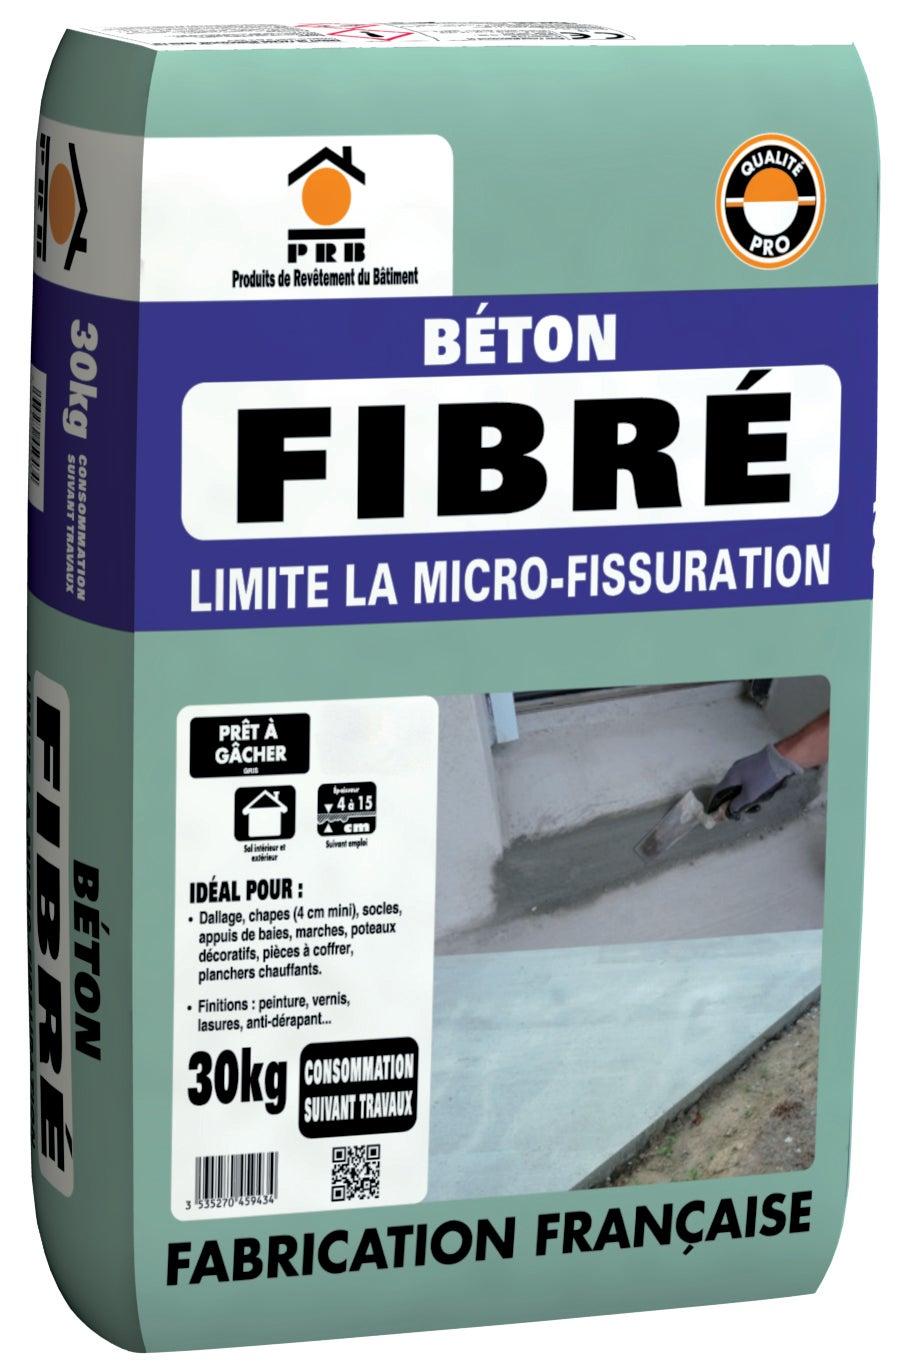 Beton Fibre Prb 30 Kg Leroy Merlin